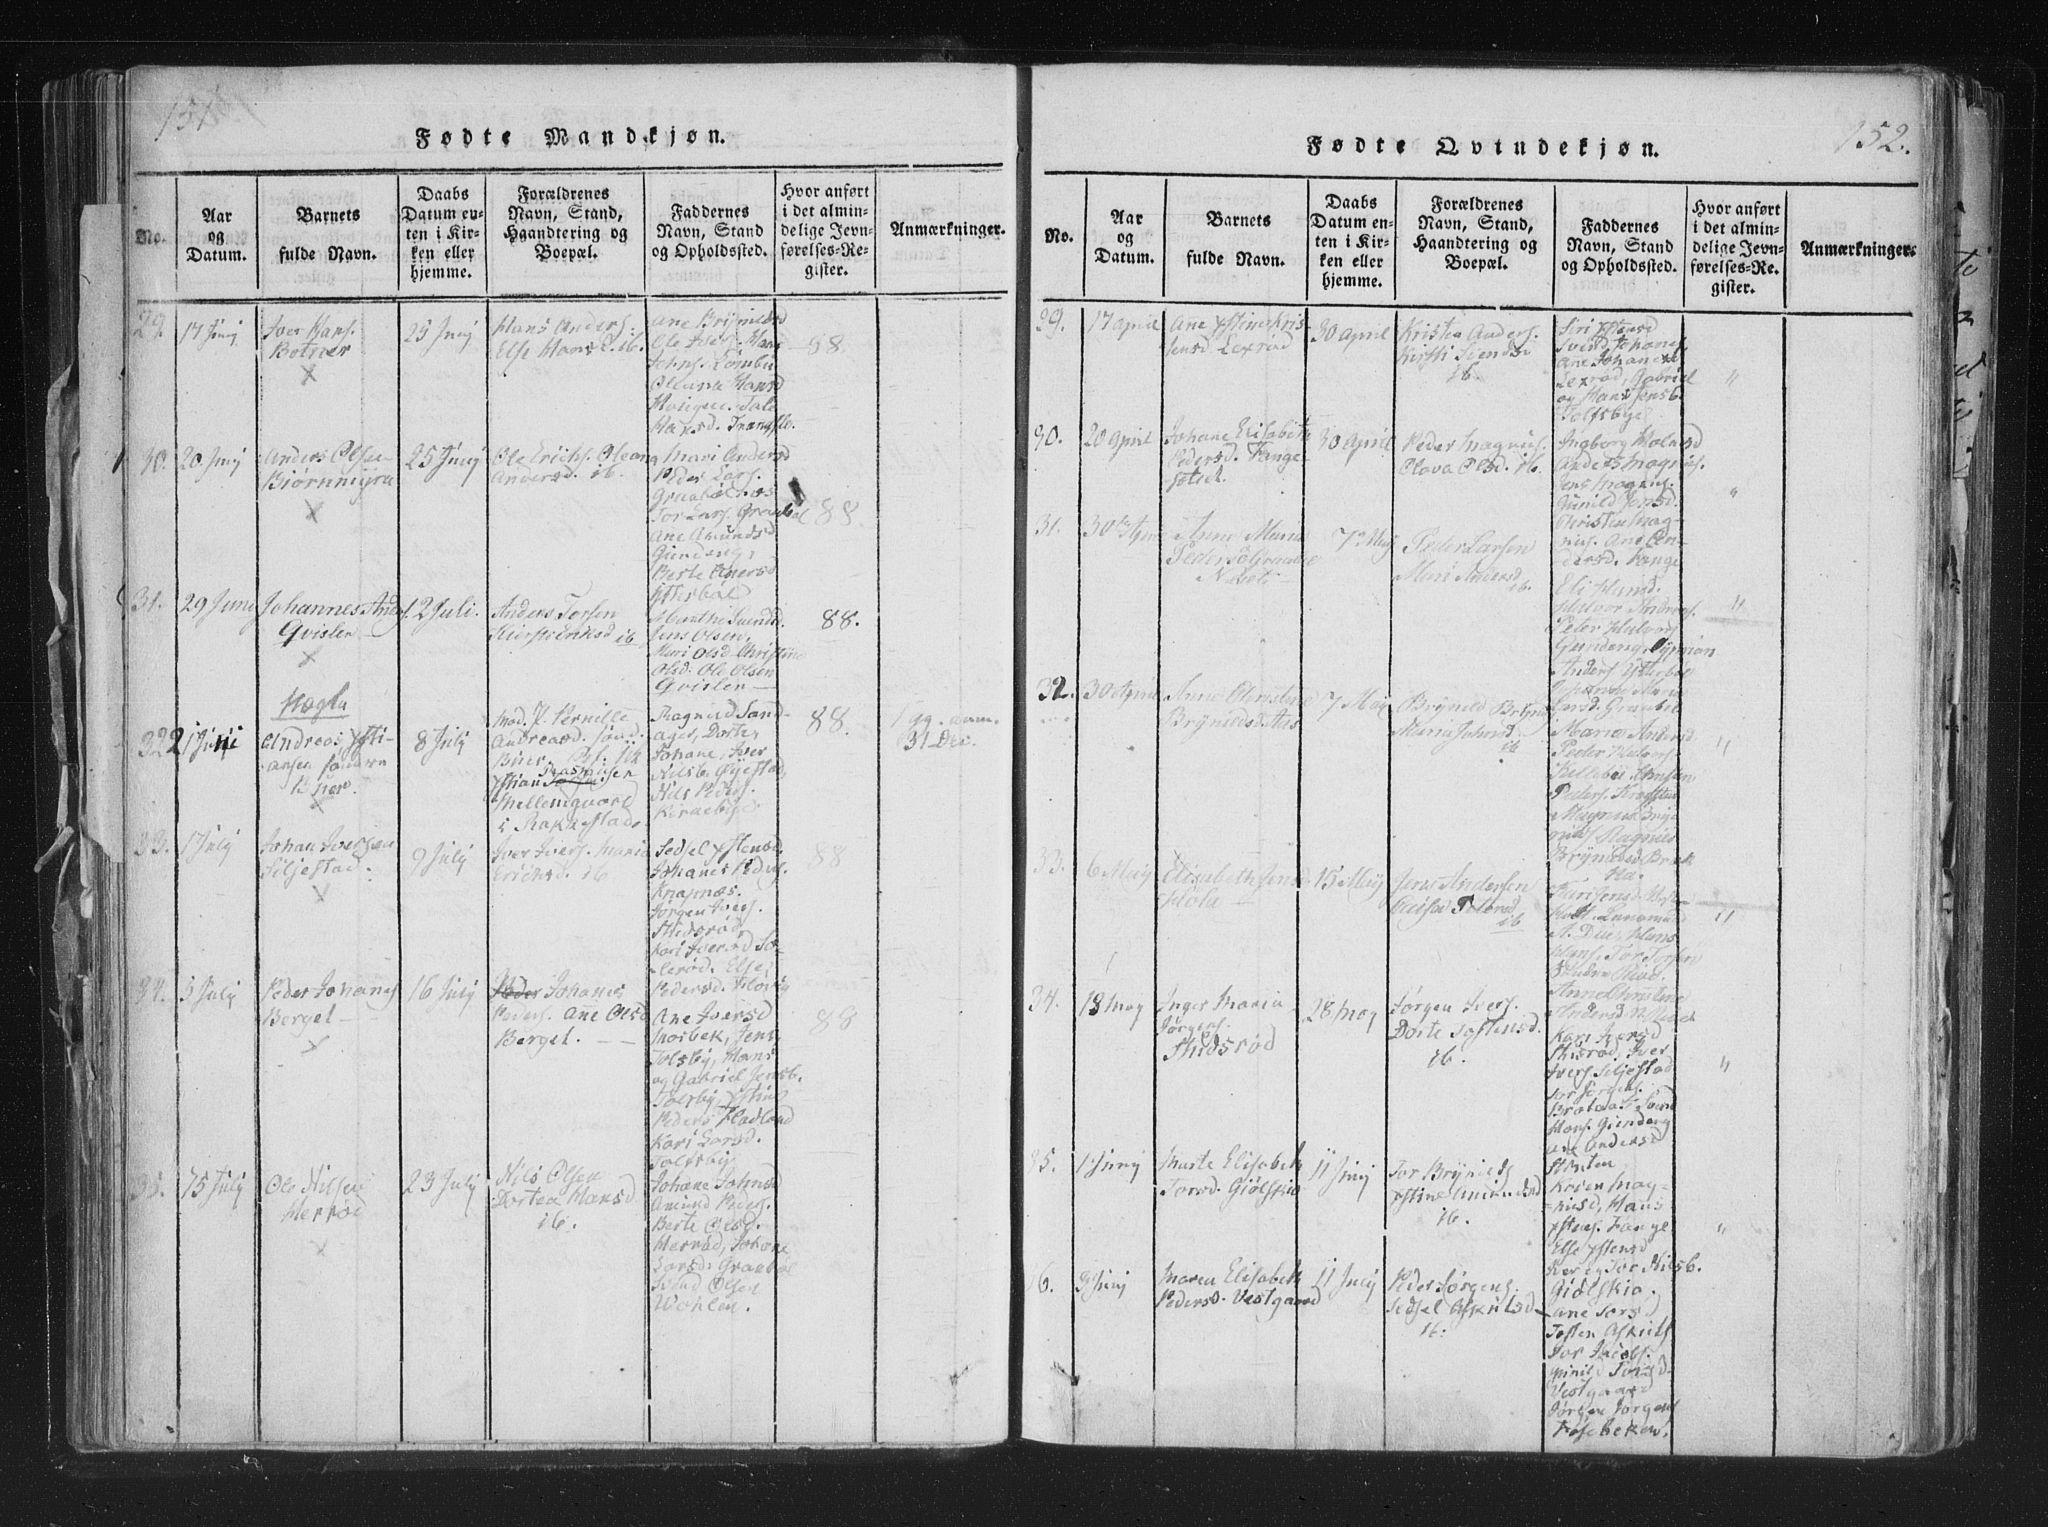 SAO, Aremark prestekontor Kirkebøker, F/Fc/L0001: Ministerialbok nr. III 1, 1814-1834, s. 151-152